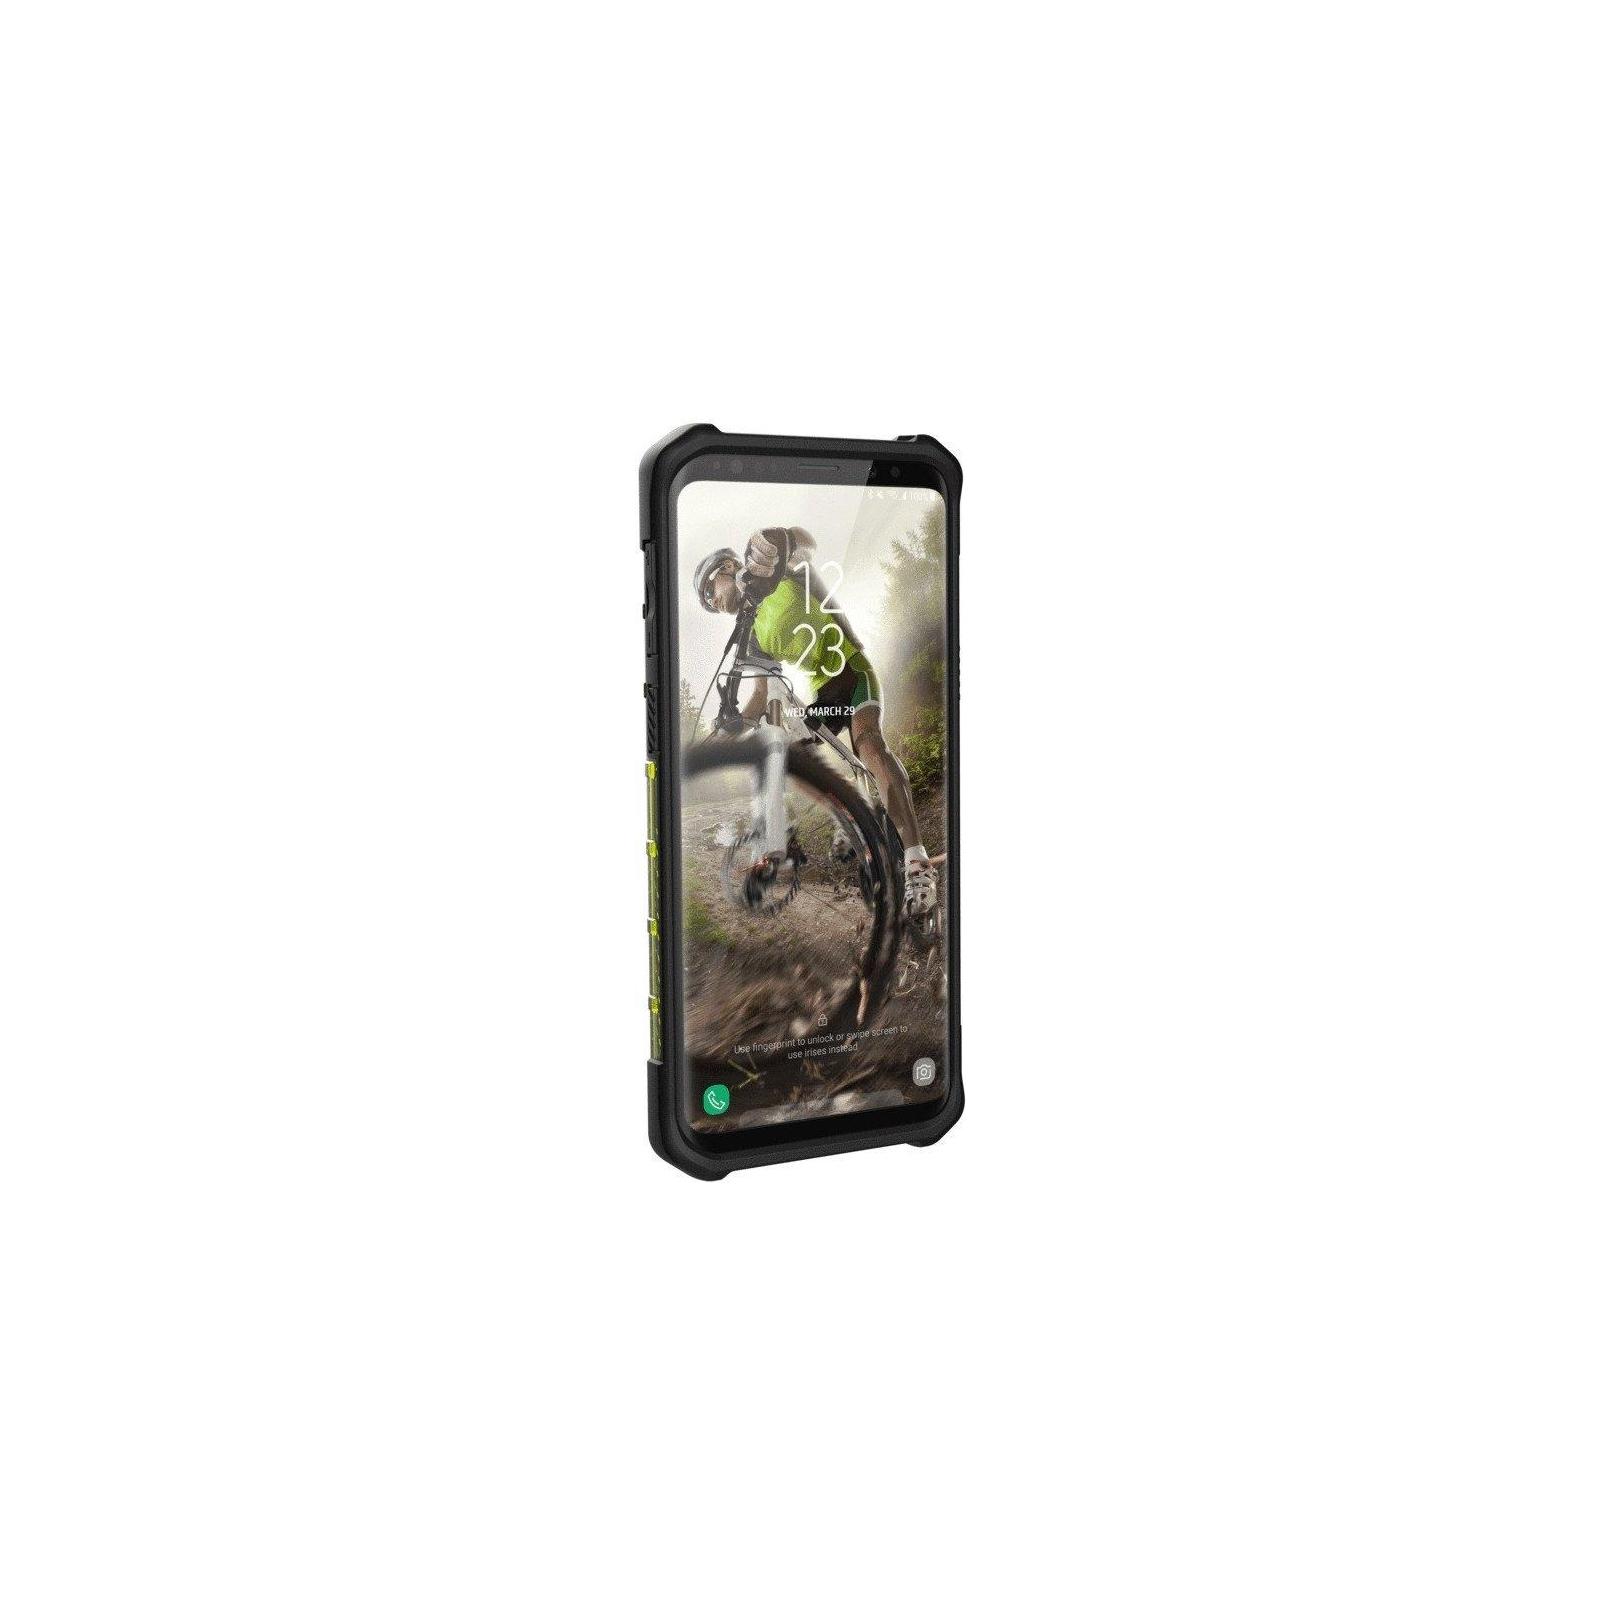 Чехол для моб. телефона Urban Armor Gear Galaxy S9 Plasma Citron (GLXS9-L-CT) изображение 5